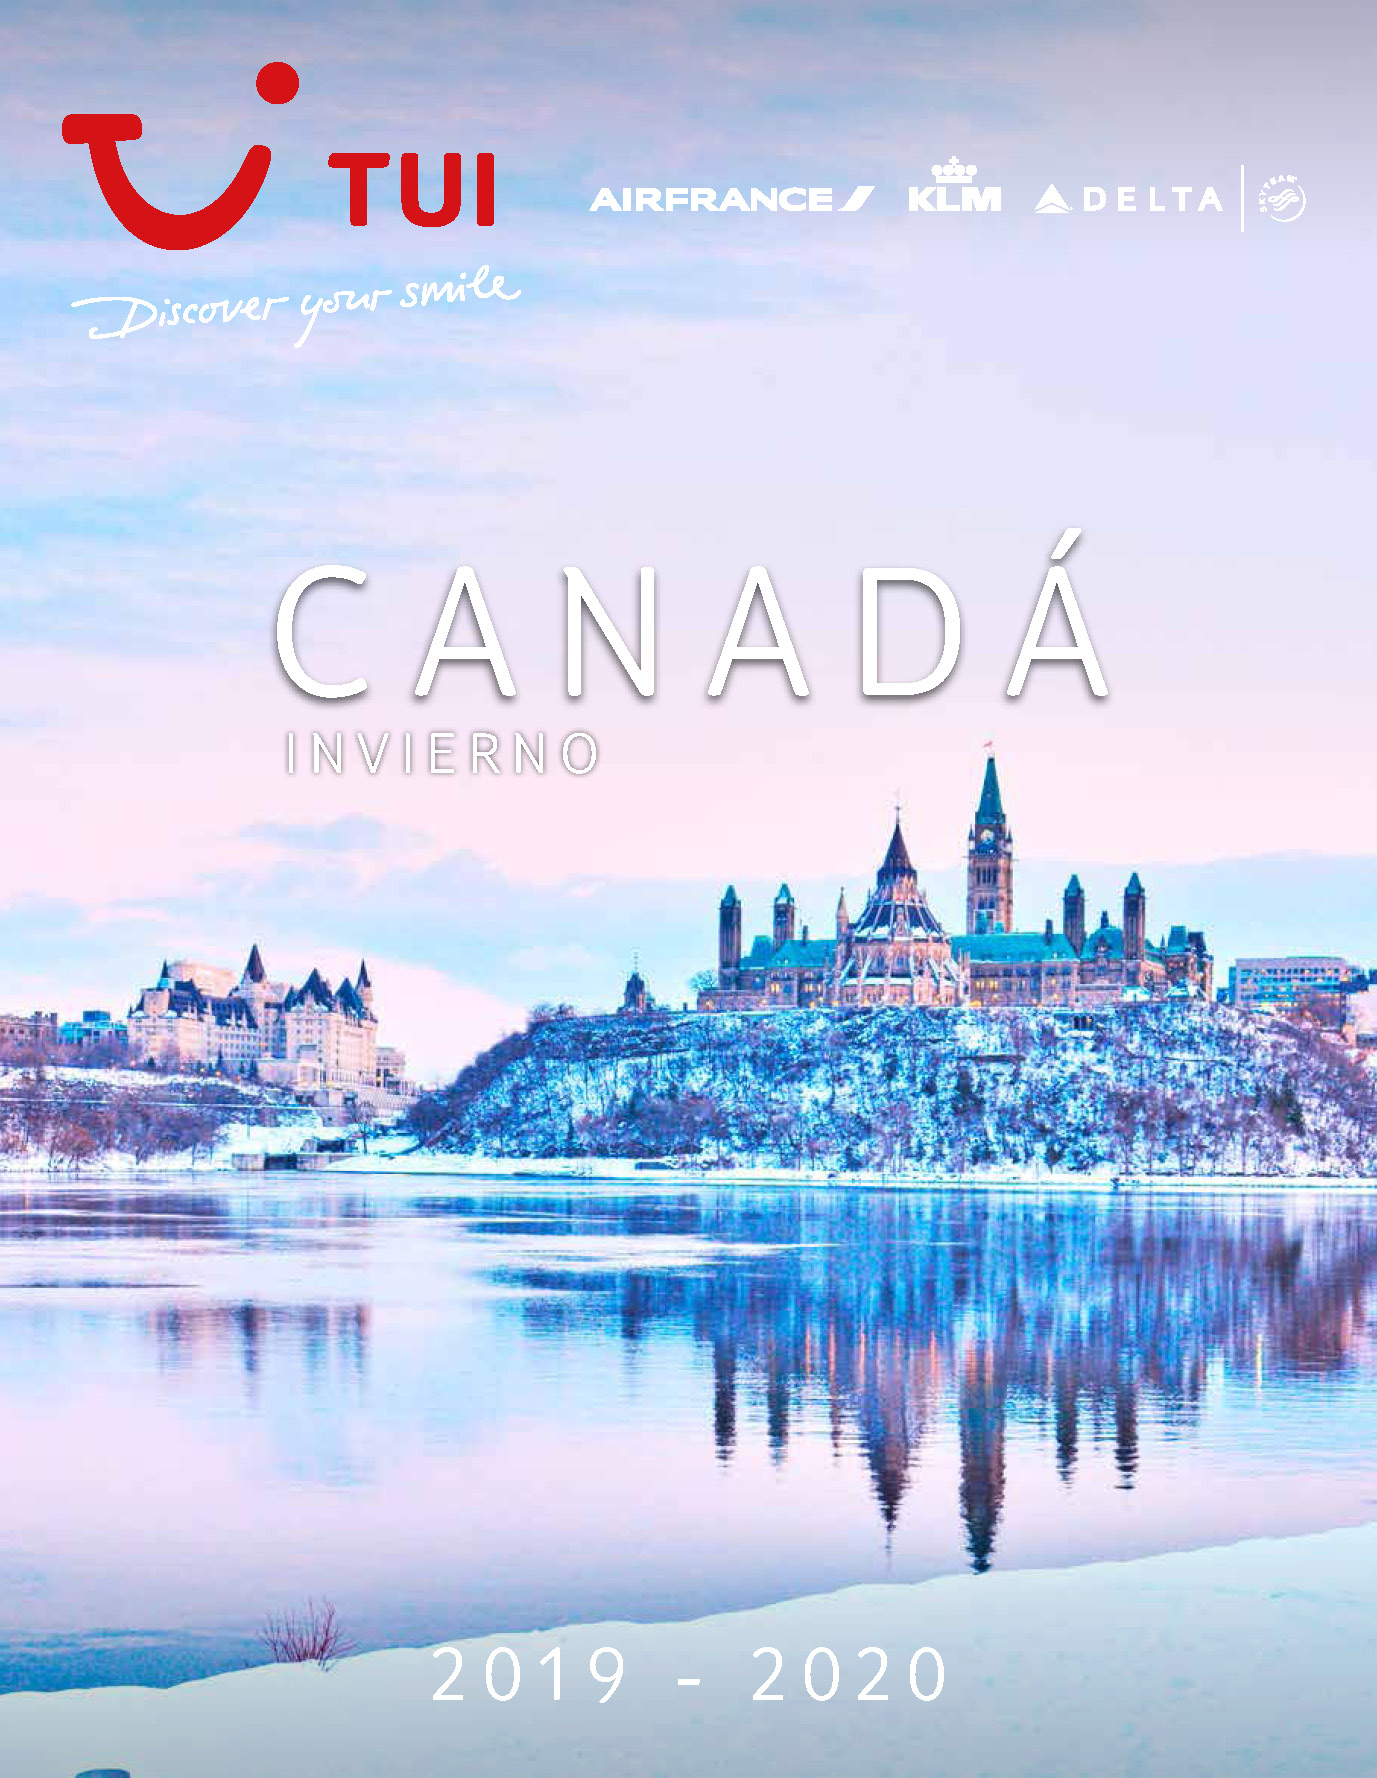 Catalogo TUI Ambassador ours Canada Invierno 2019-2020